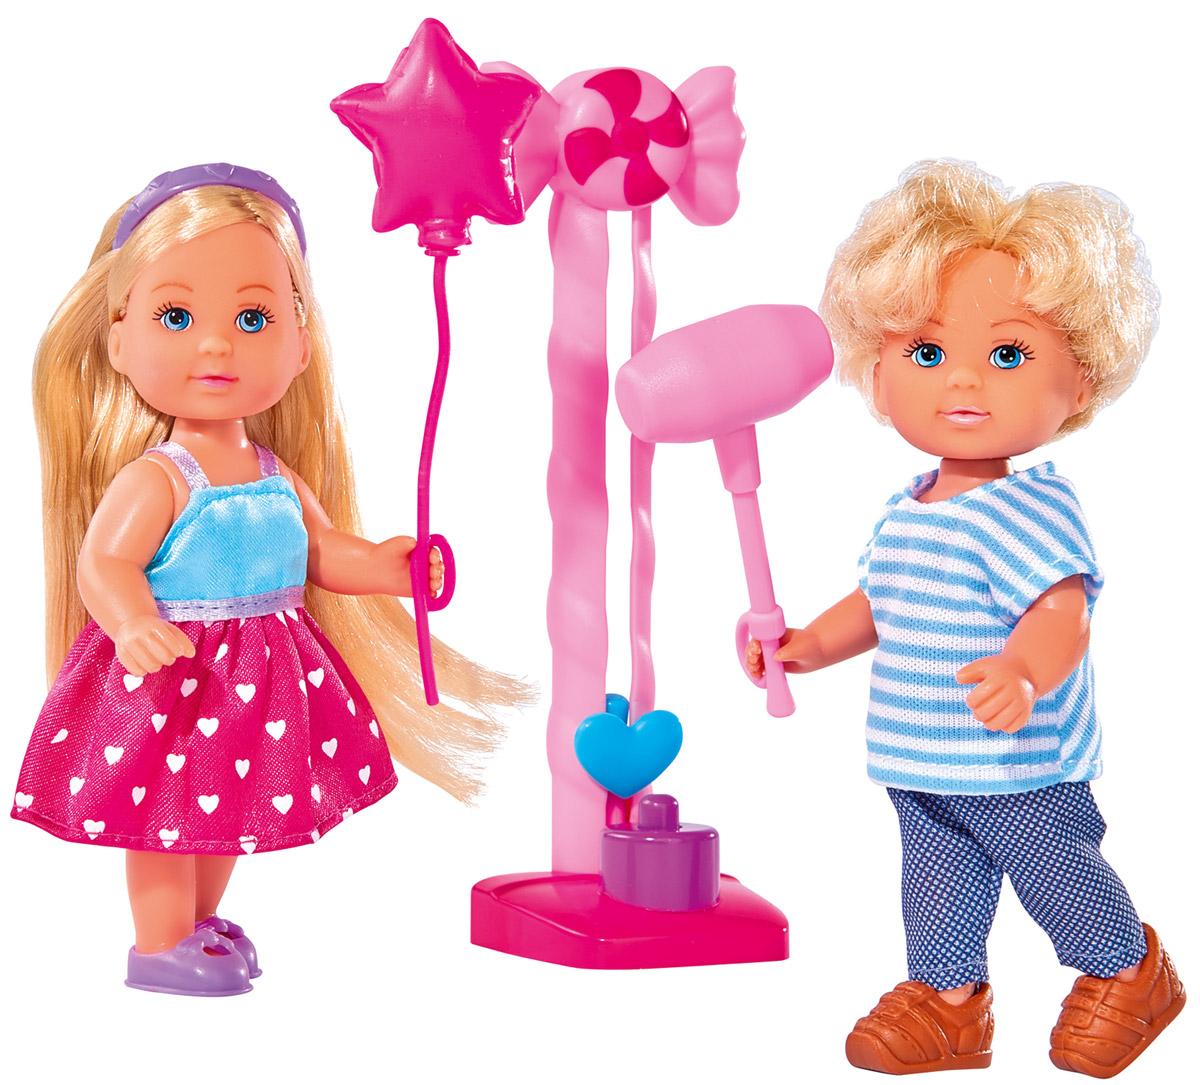 Simba Набор кукол Еви и Тимми на аттракционах куклы и одежда для кукол simba кукла еви и тимми на аттракционах 12 cм